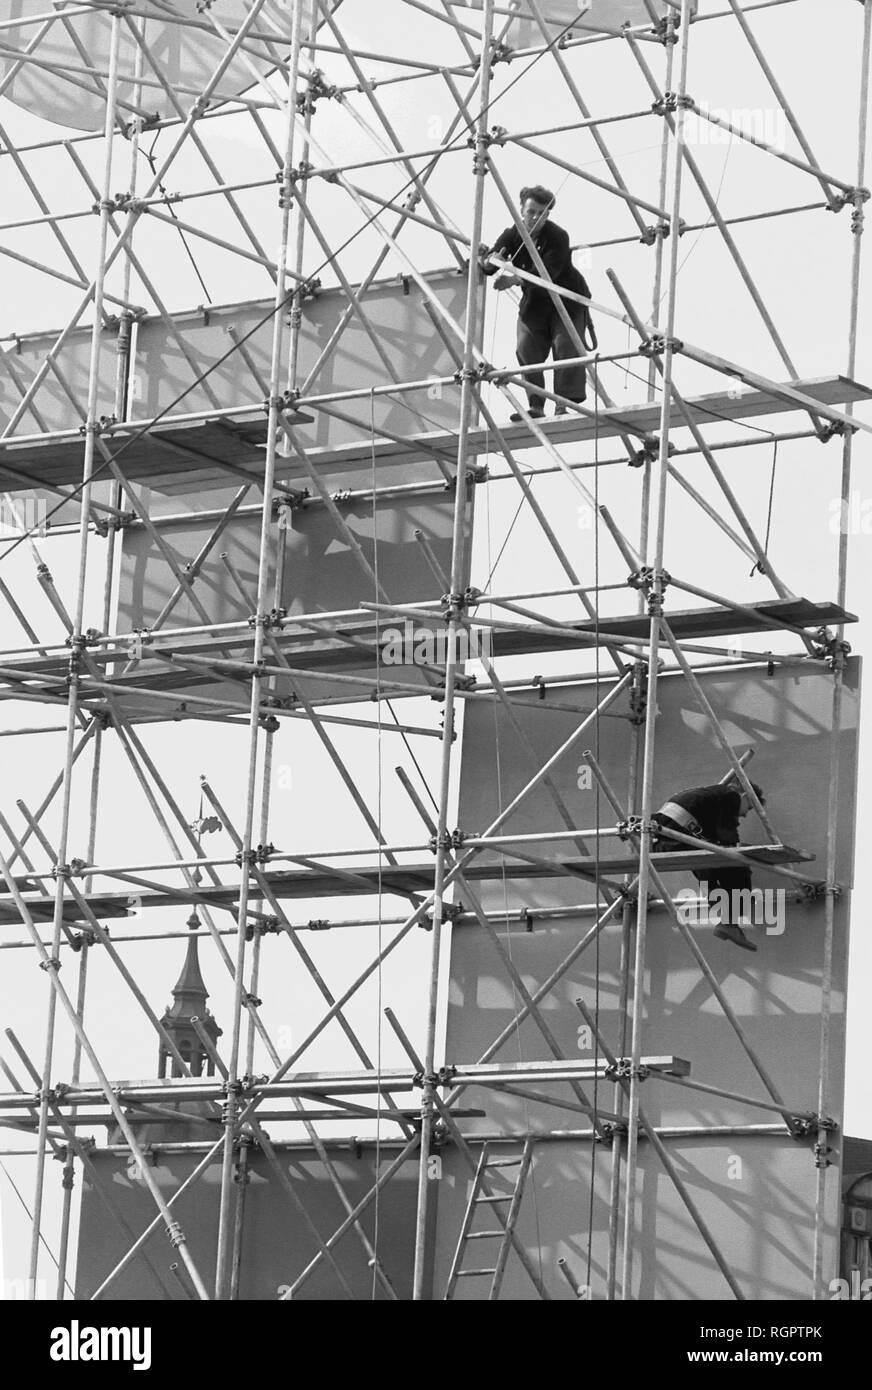 Propaganda, scaffolding for the attachment of a slogan, 1959, Leipzig, Saxony, GDR, Germany - Stock Image